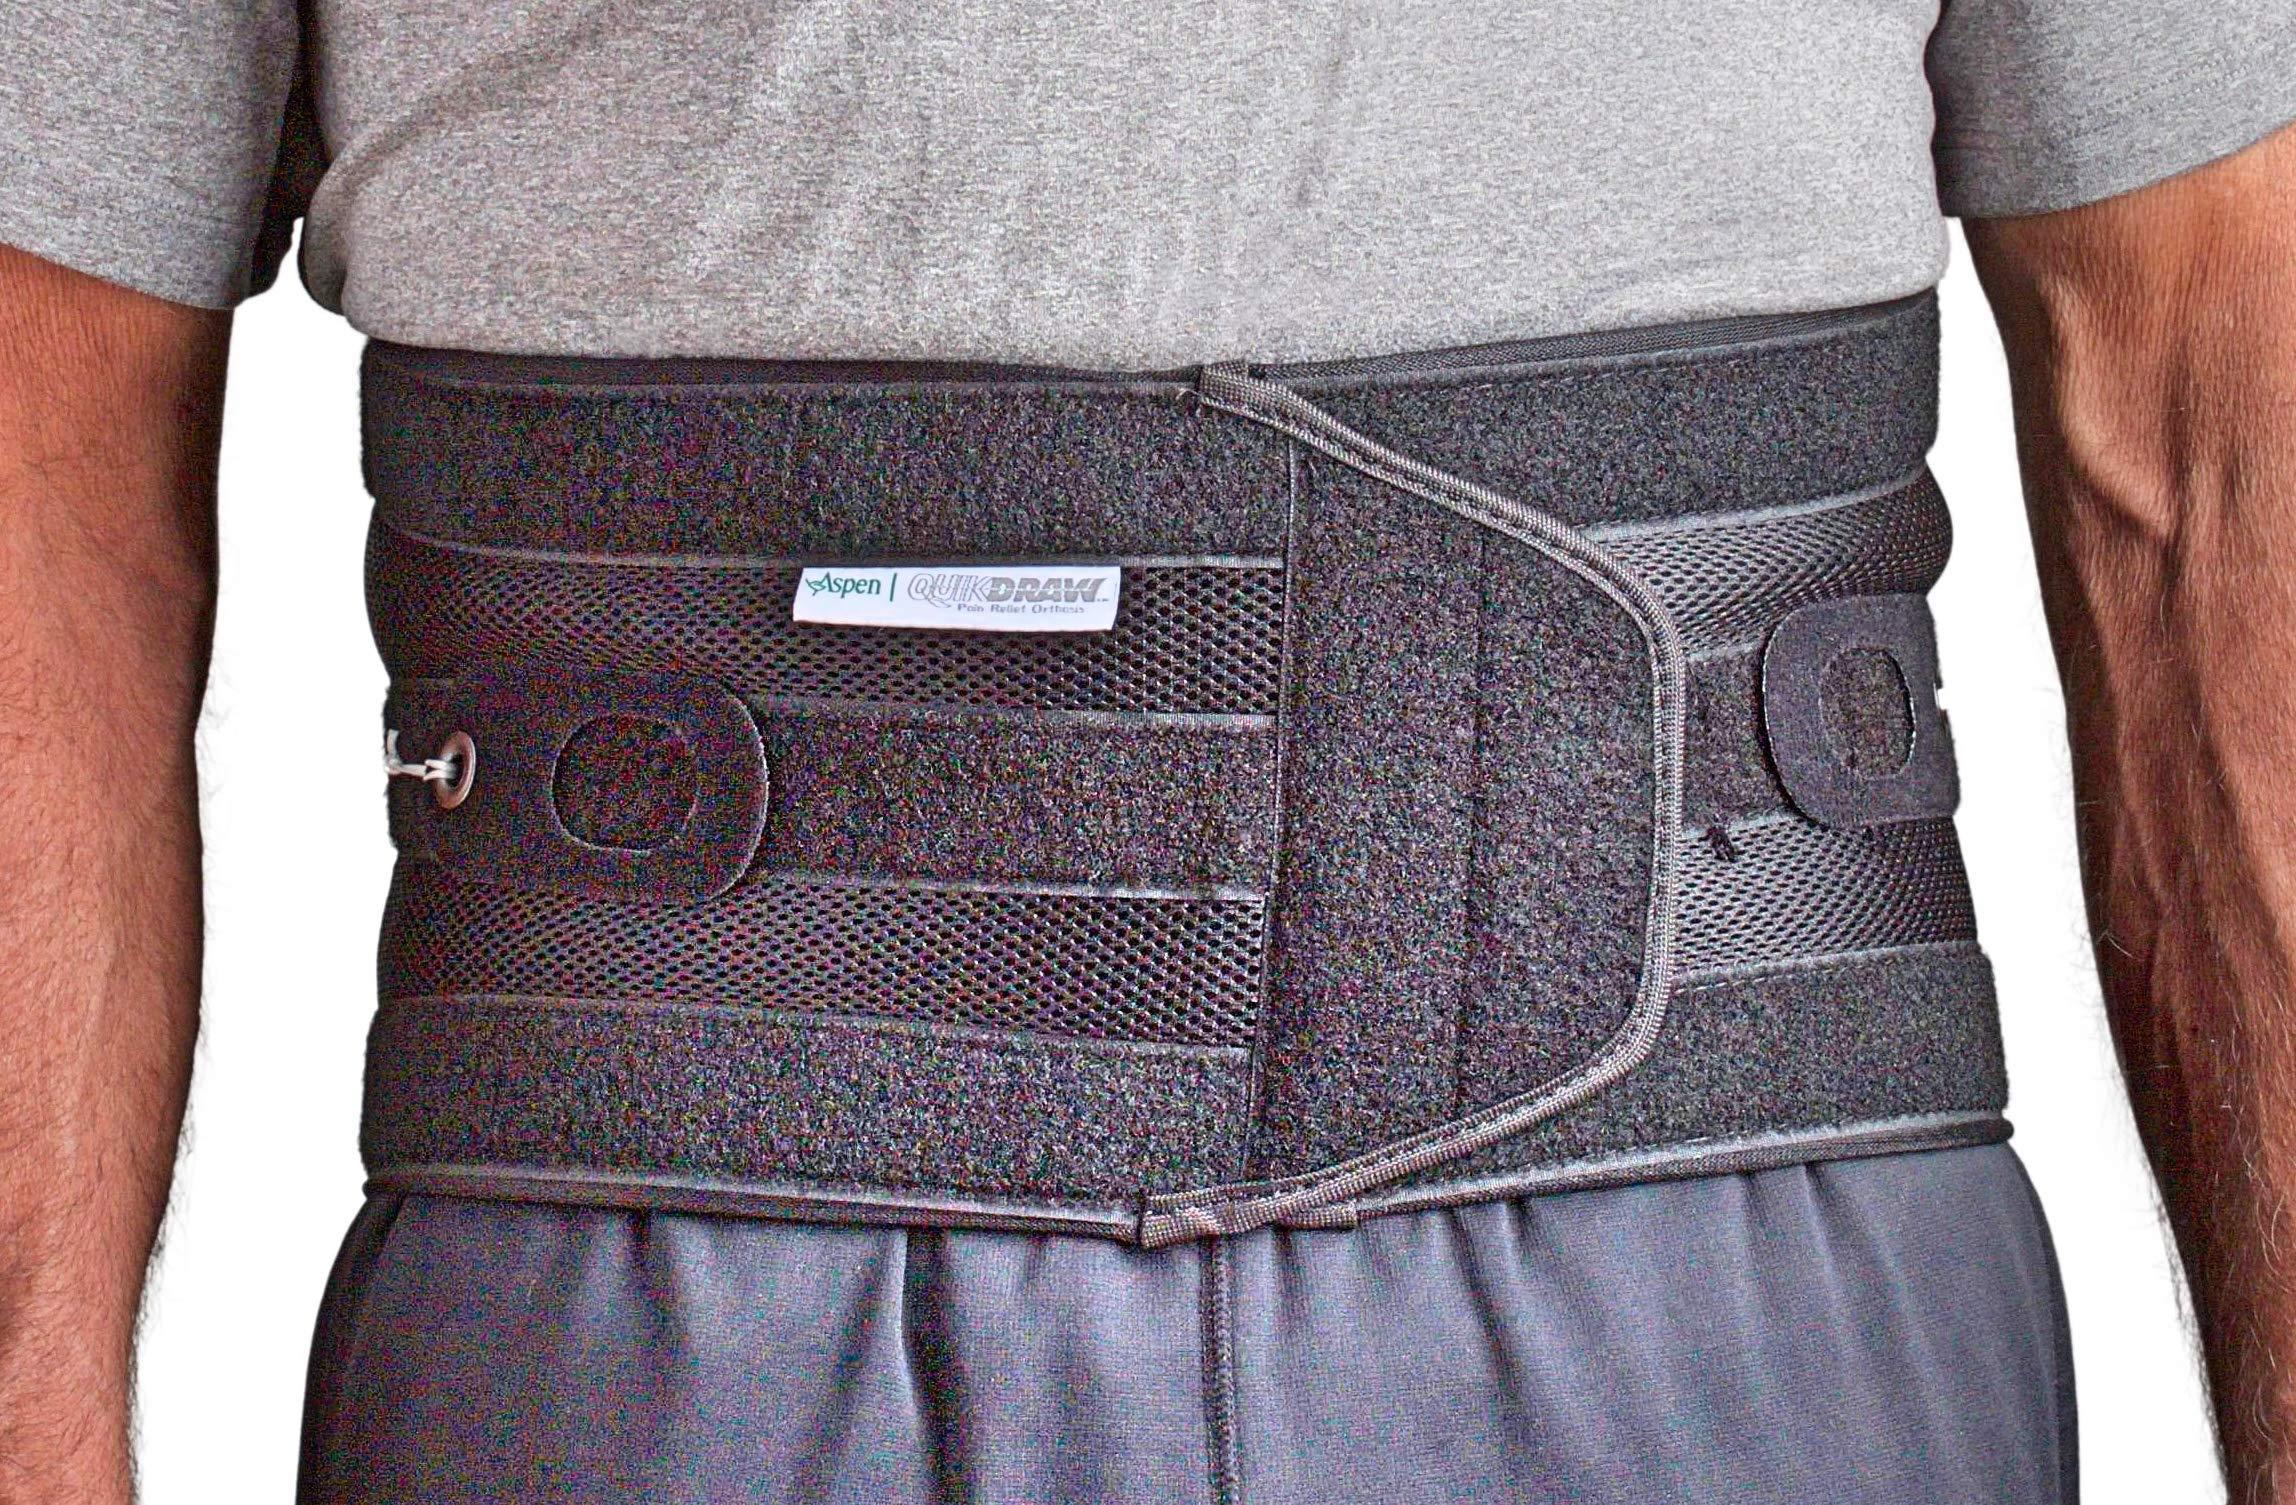 Aspen Quikdraw PRO Back Brace, Back Braces for Lower Back Pain Women & Men fits Belly (NOT Waist) Size 46''-57'', Lumbar Back Brace, Back Support Belt for Men, Lumbar Support Belt (Black, XX-Large) by Aspen Medical Products